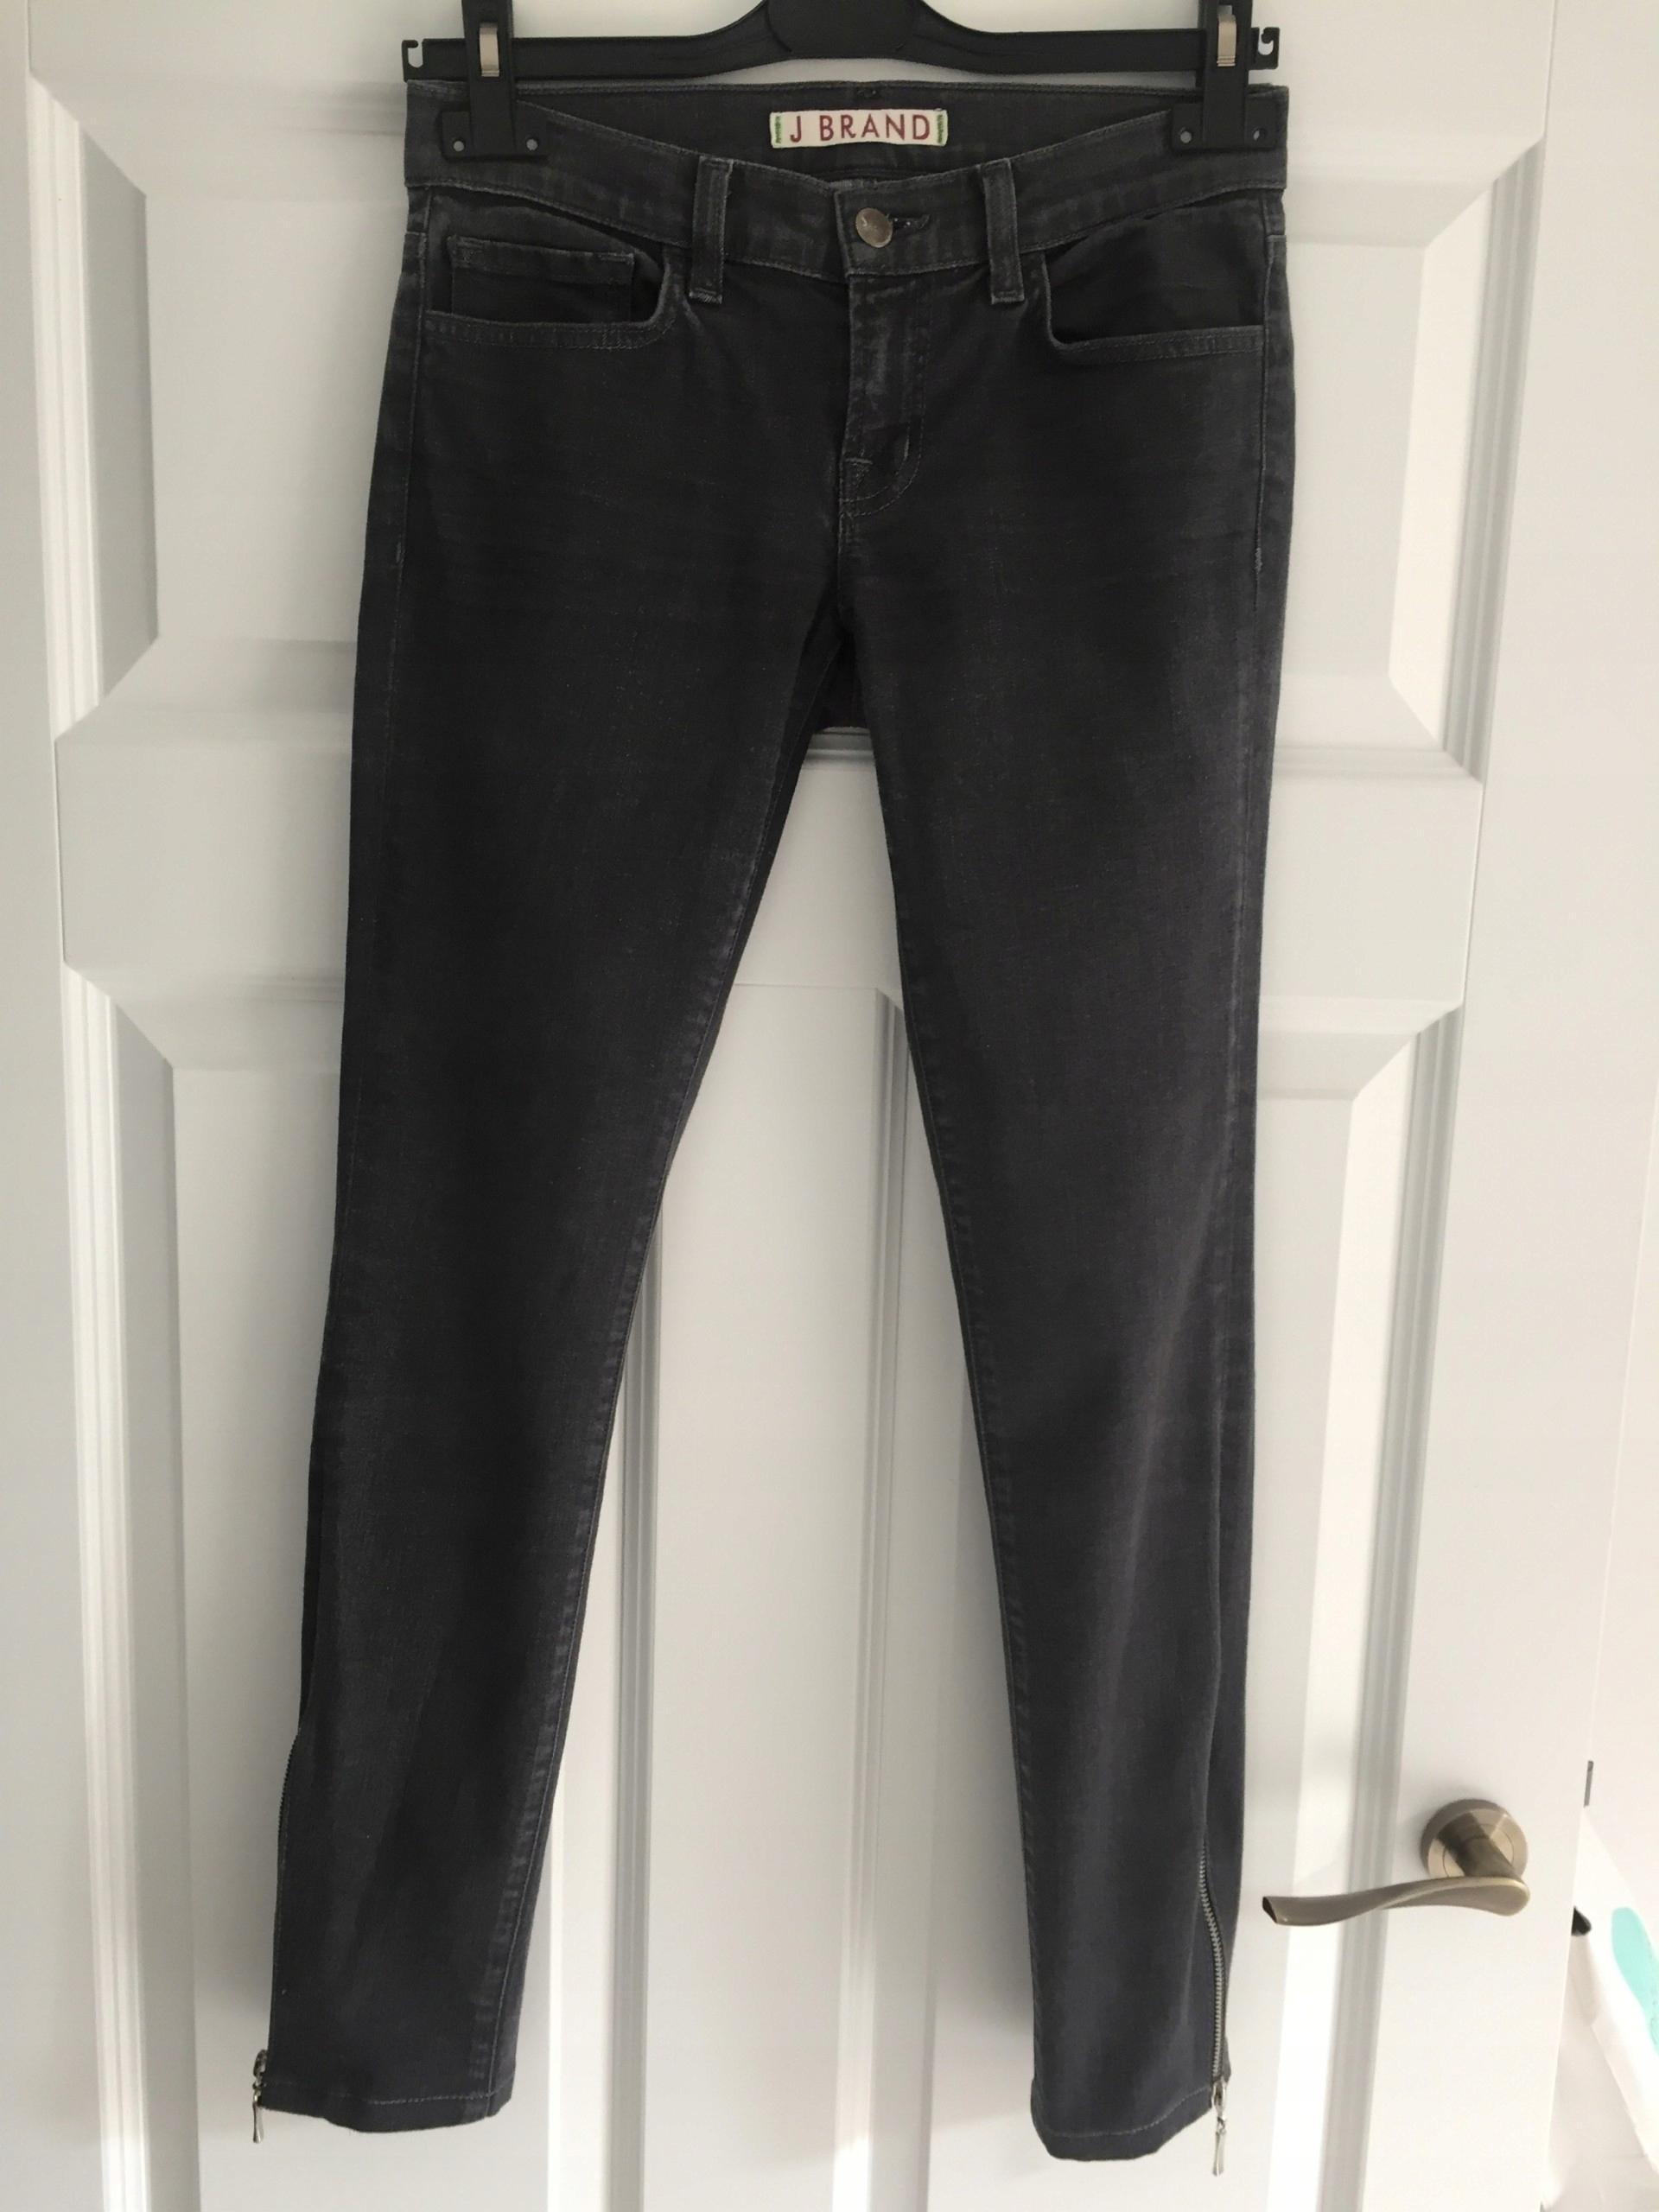 6e61d65d J brand szare jeansy 25 nogawki z zamkami - 7544935756 - oficjalne ...